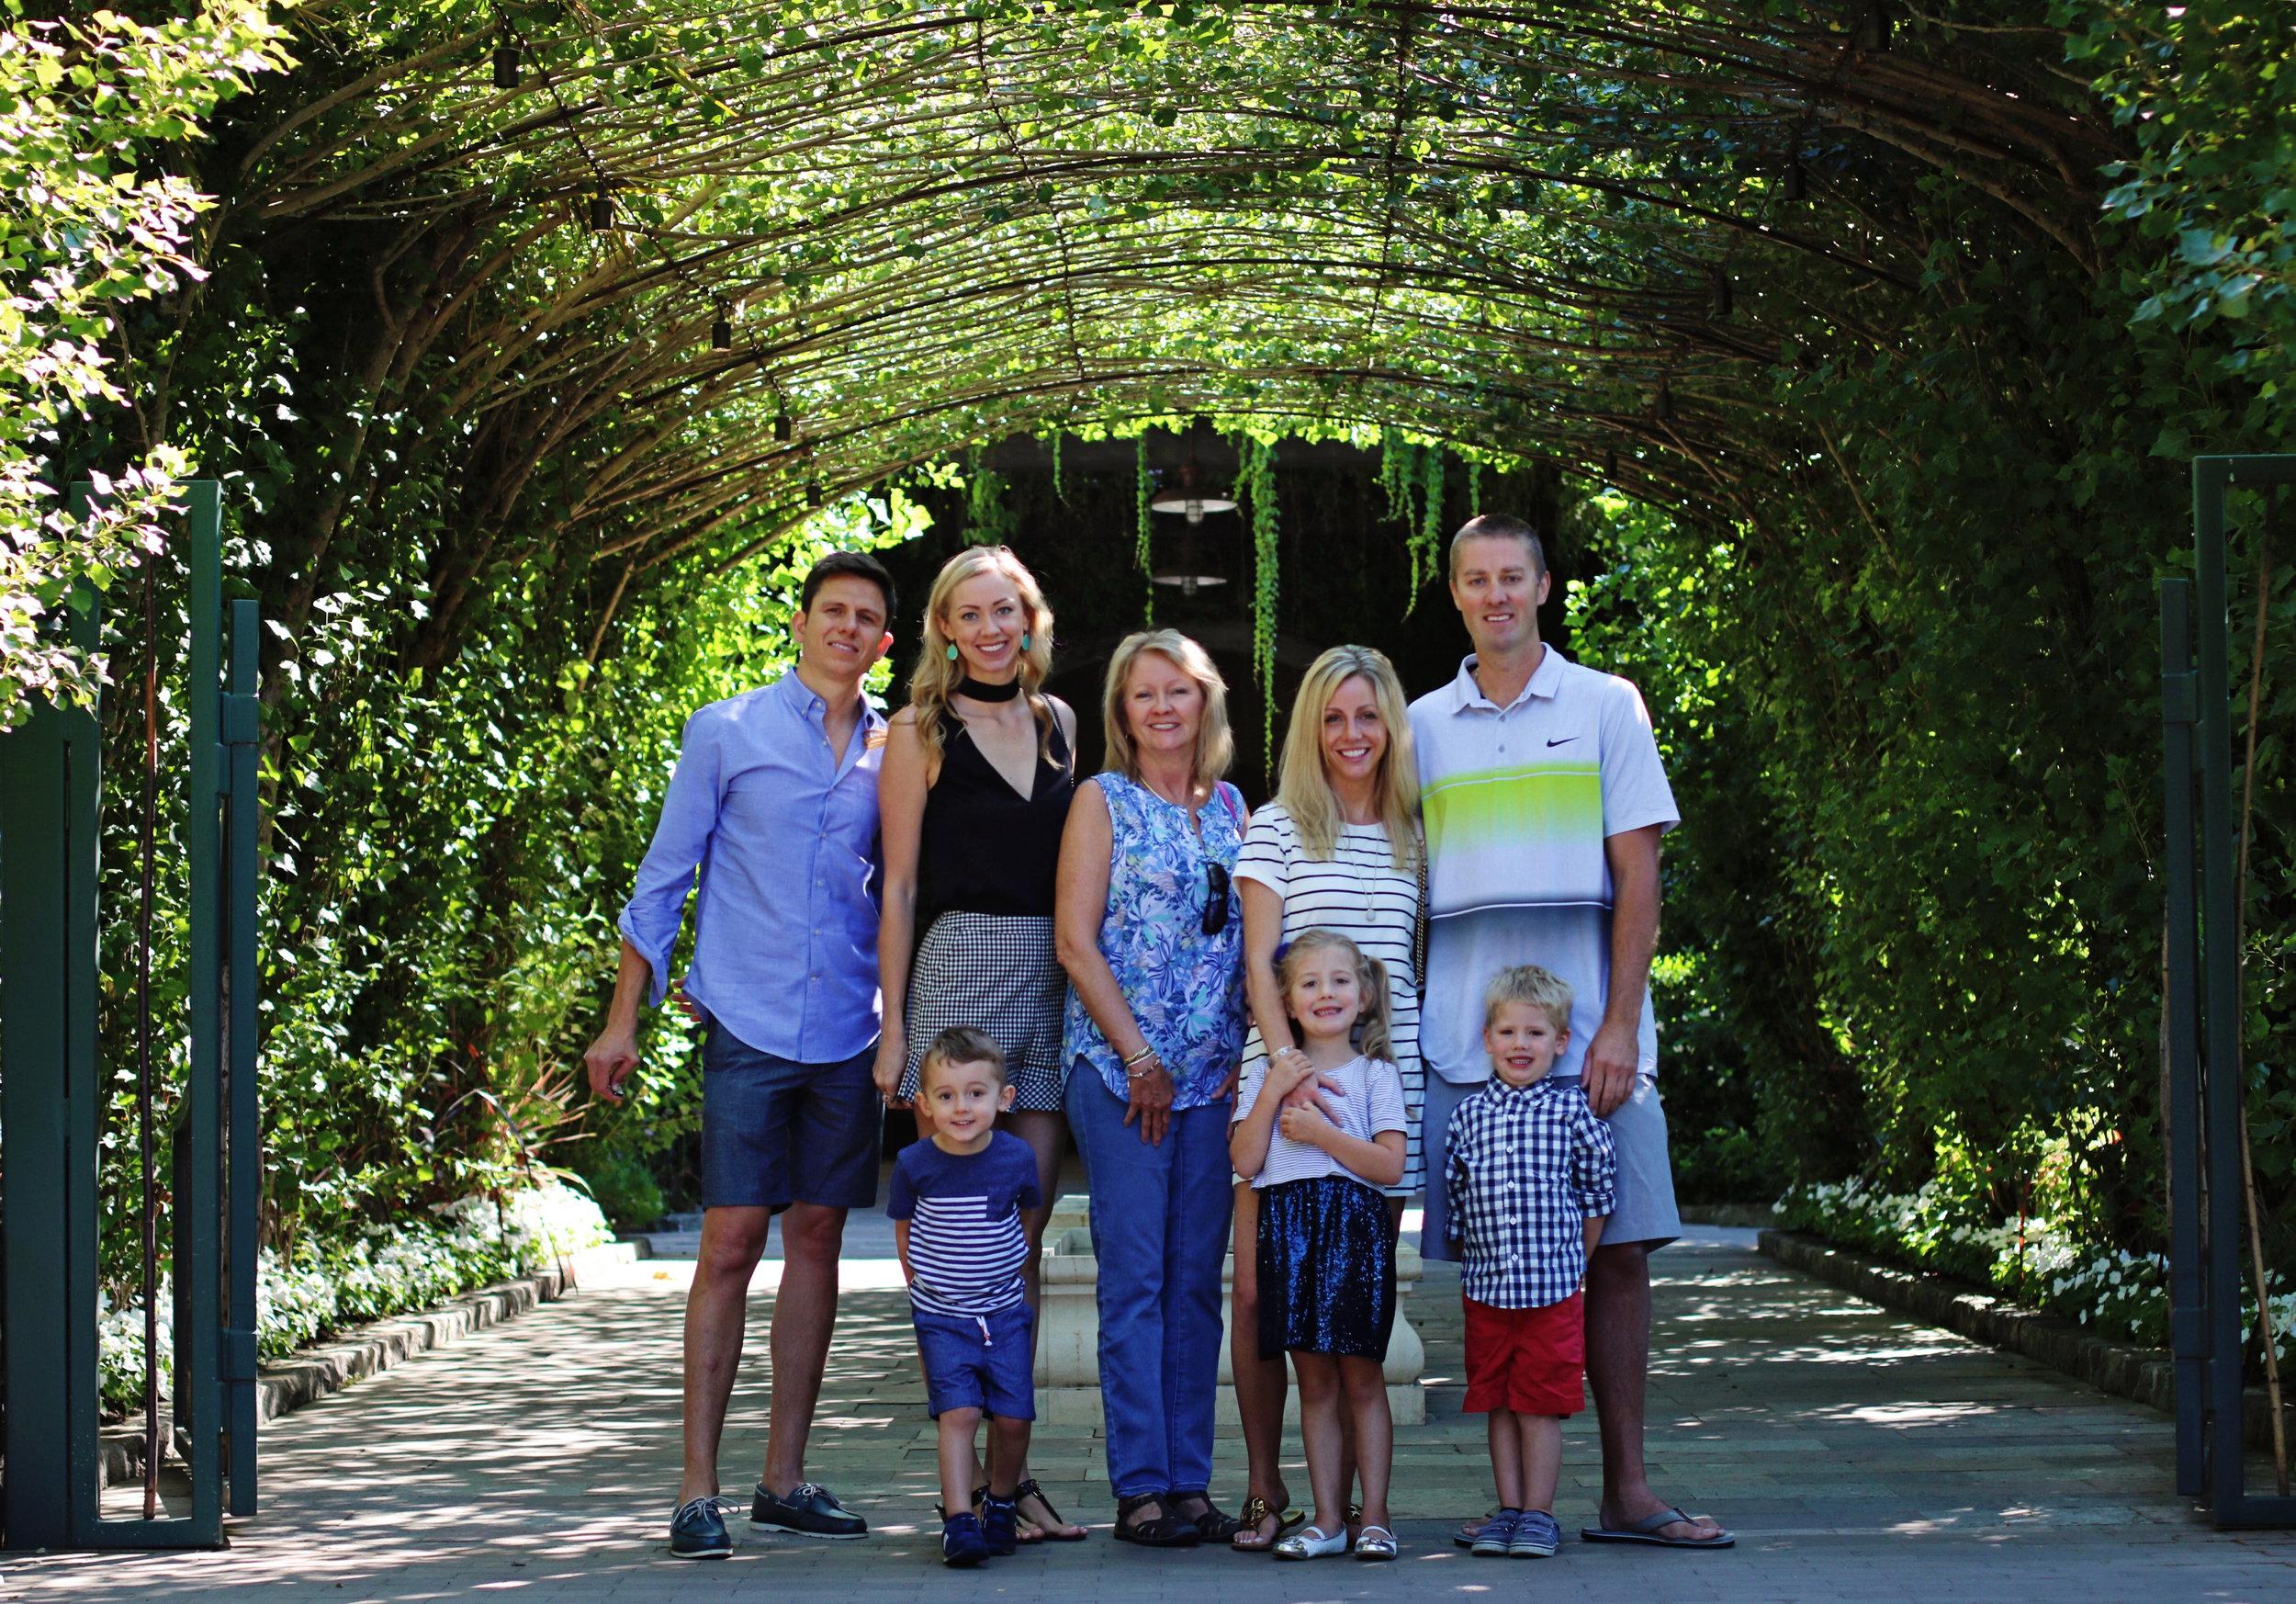 caymus-family-photo-2017.jpg